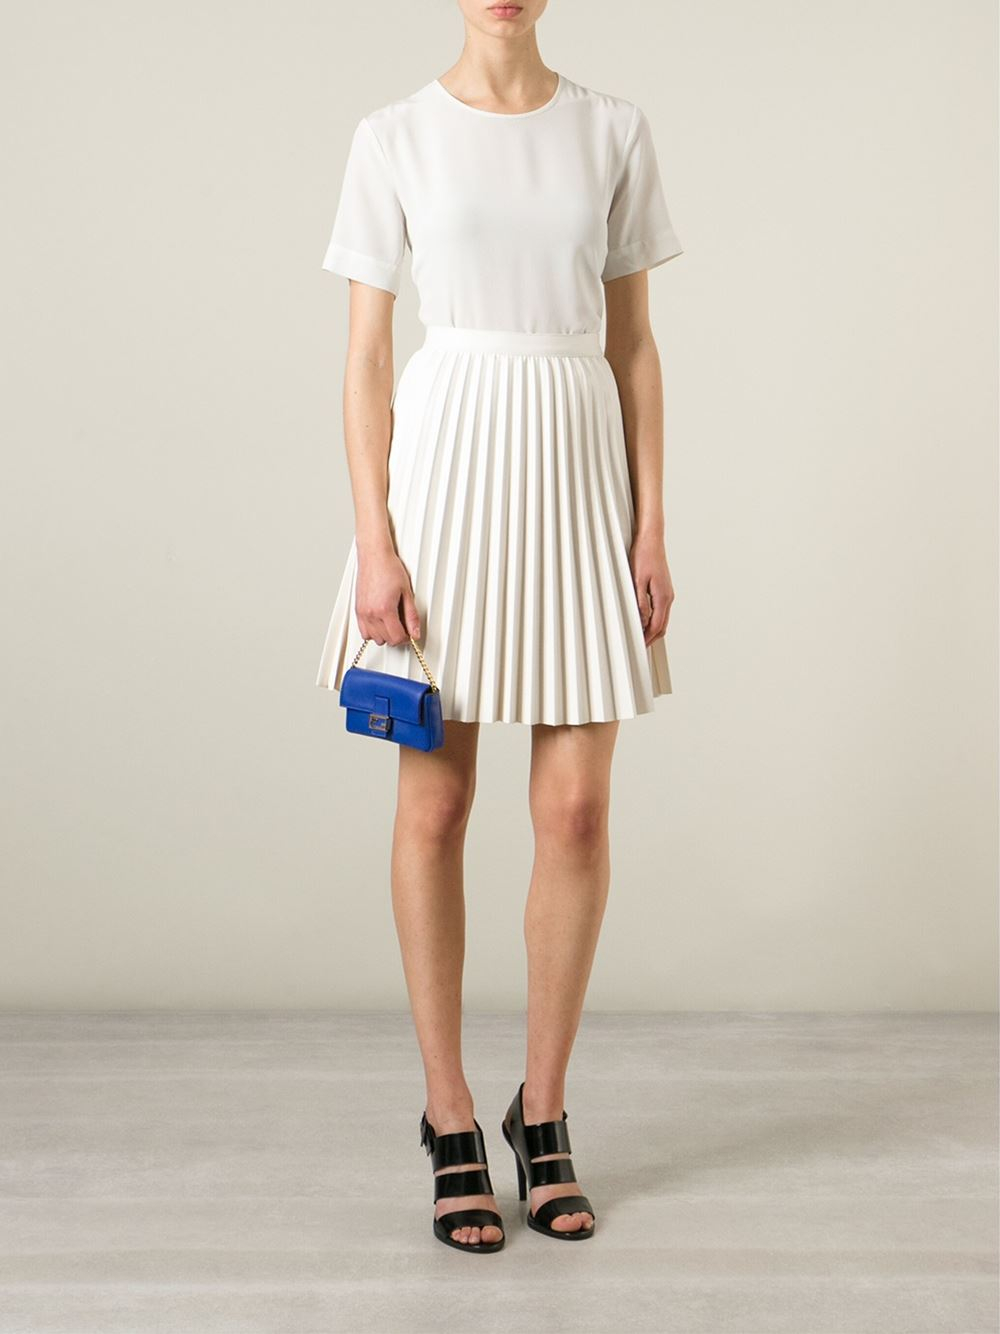 wholesale fendi mini baguette shoulder bag 3ae9f 9c18e  promo code for lyst  fendi micro baguette shoulder bag in blue 02c64 b6484 ac07802fdd2a5